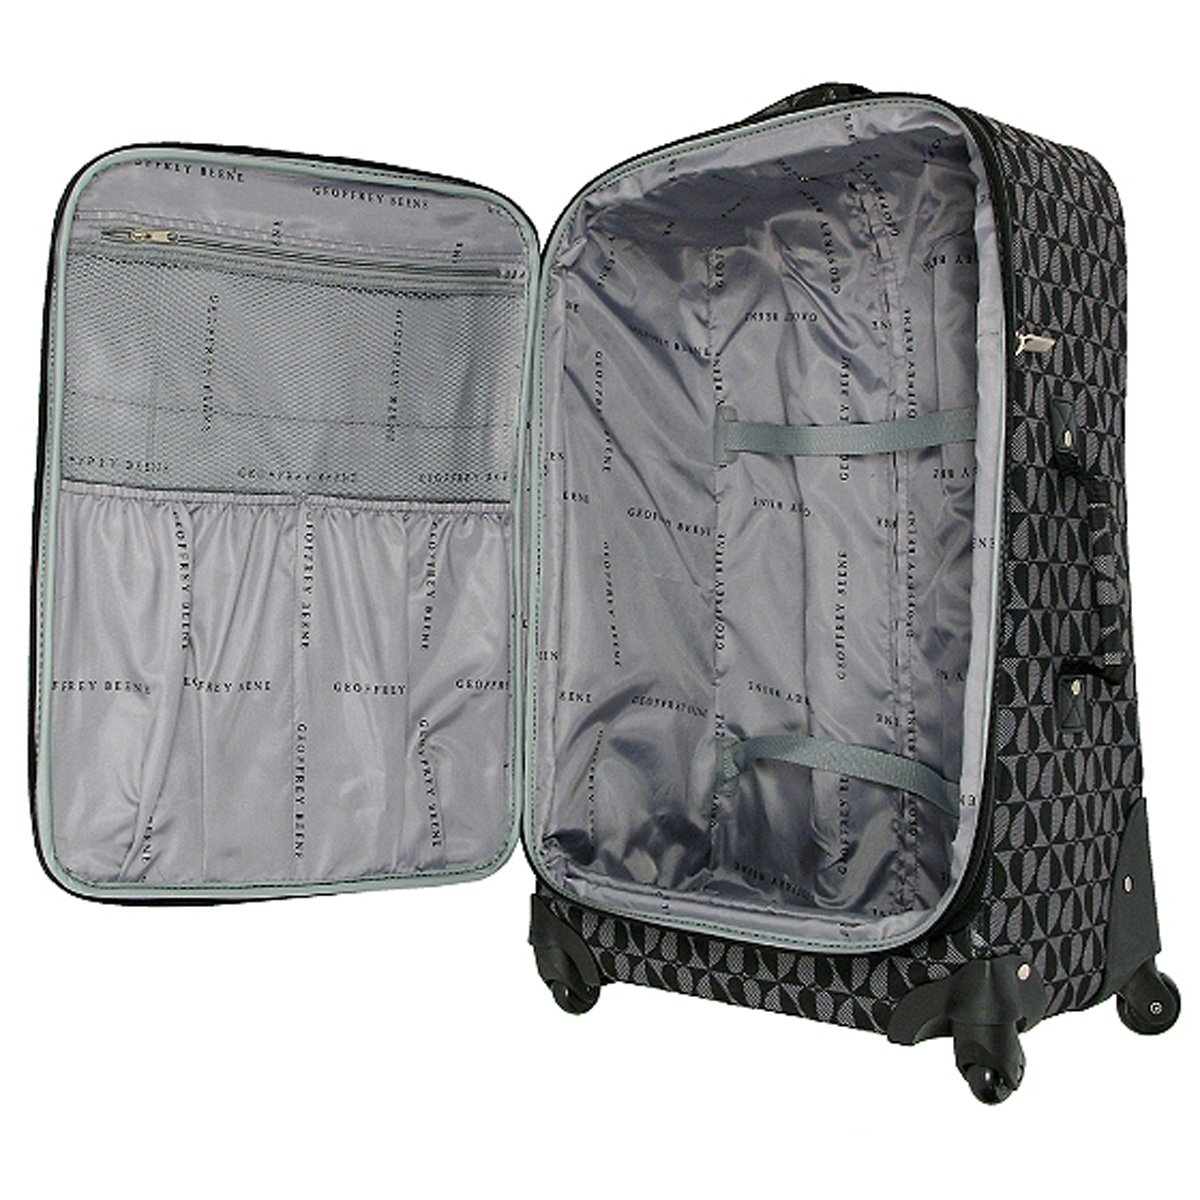 The Grey//black Geoffrey Beene 3-piece Hearts Luggage Set